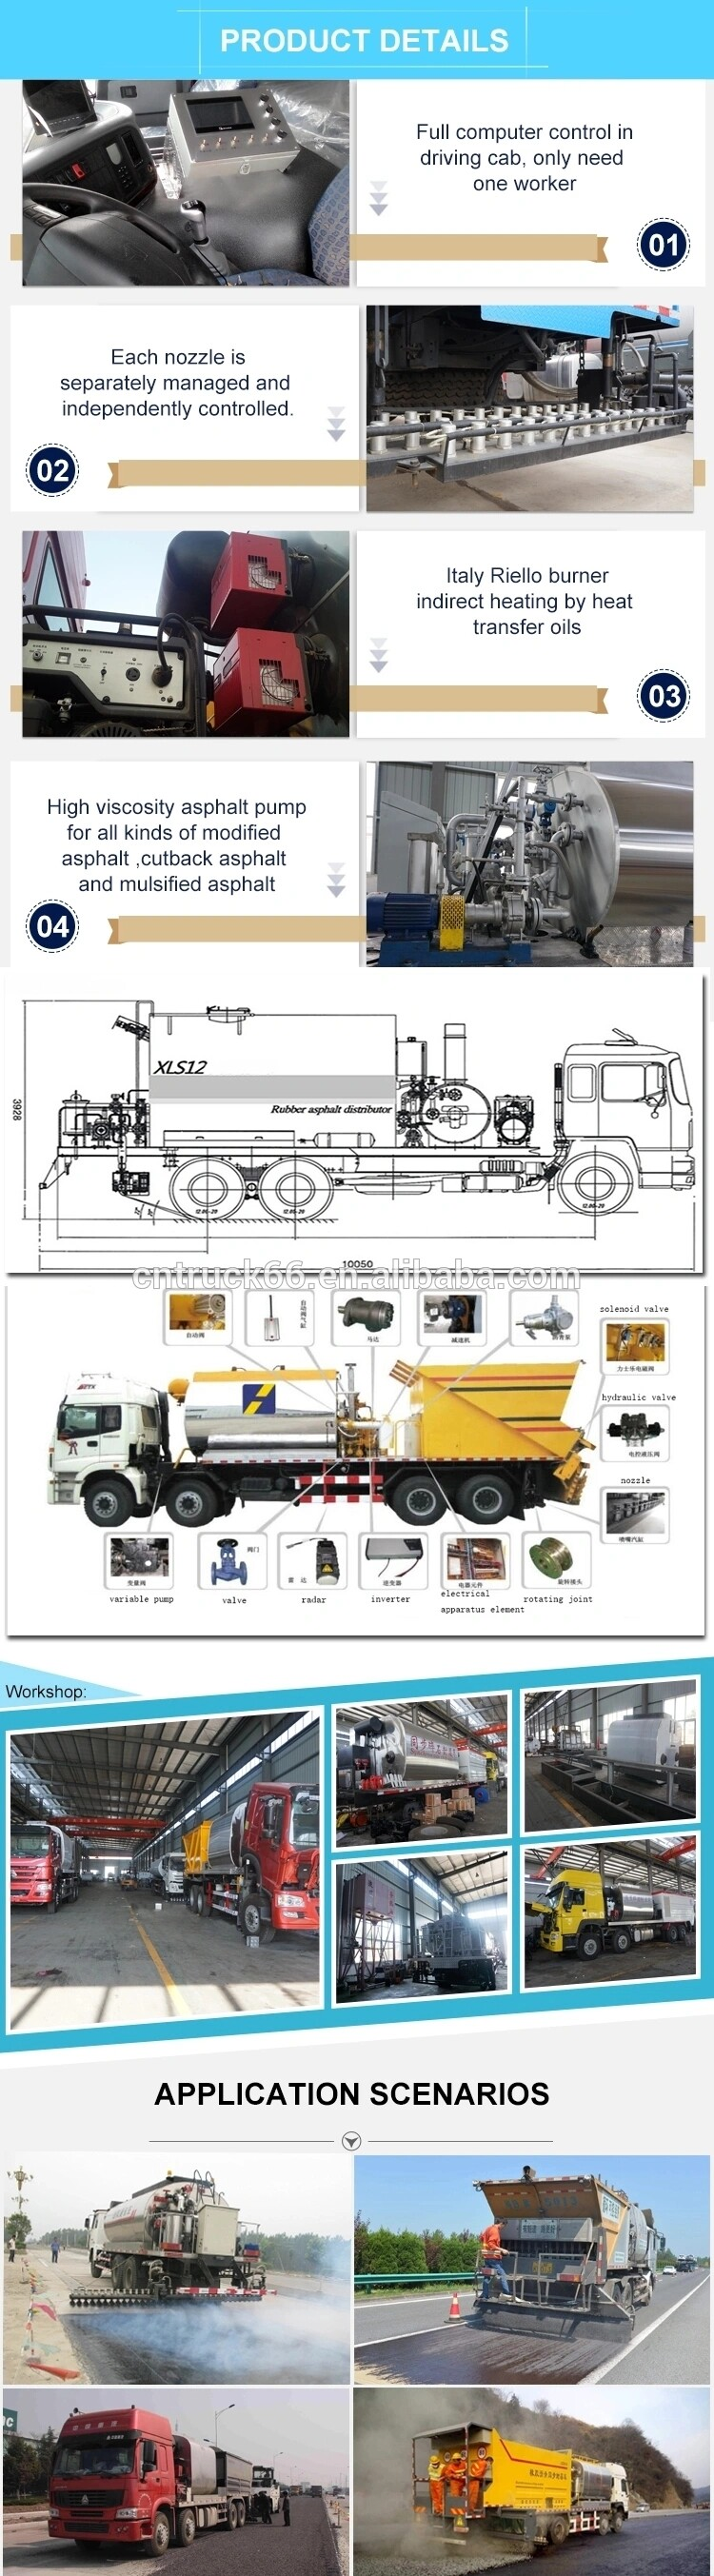 asphalt sprayer truck details